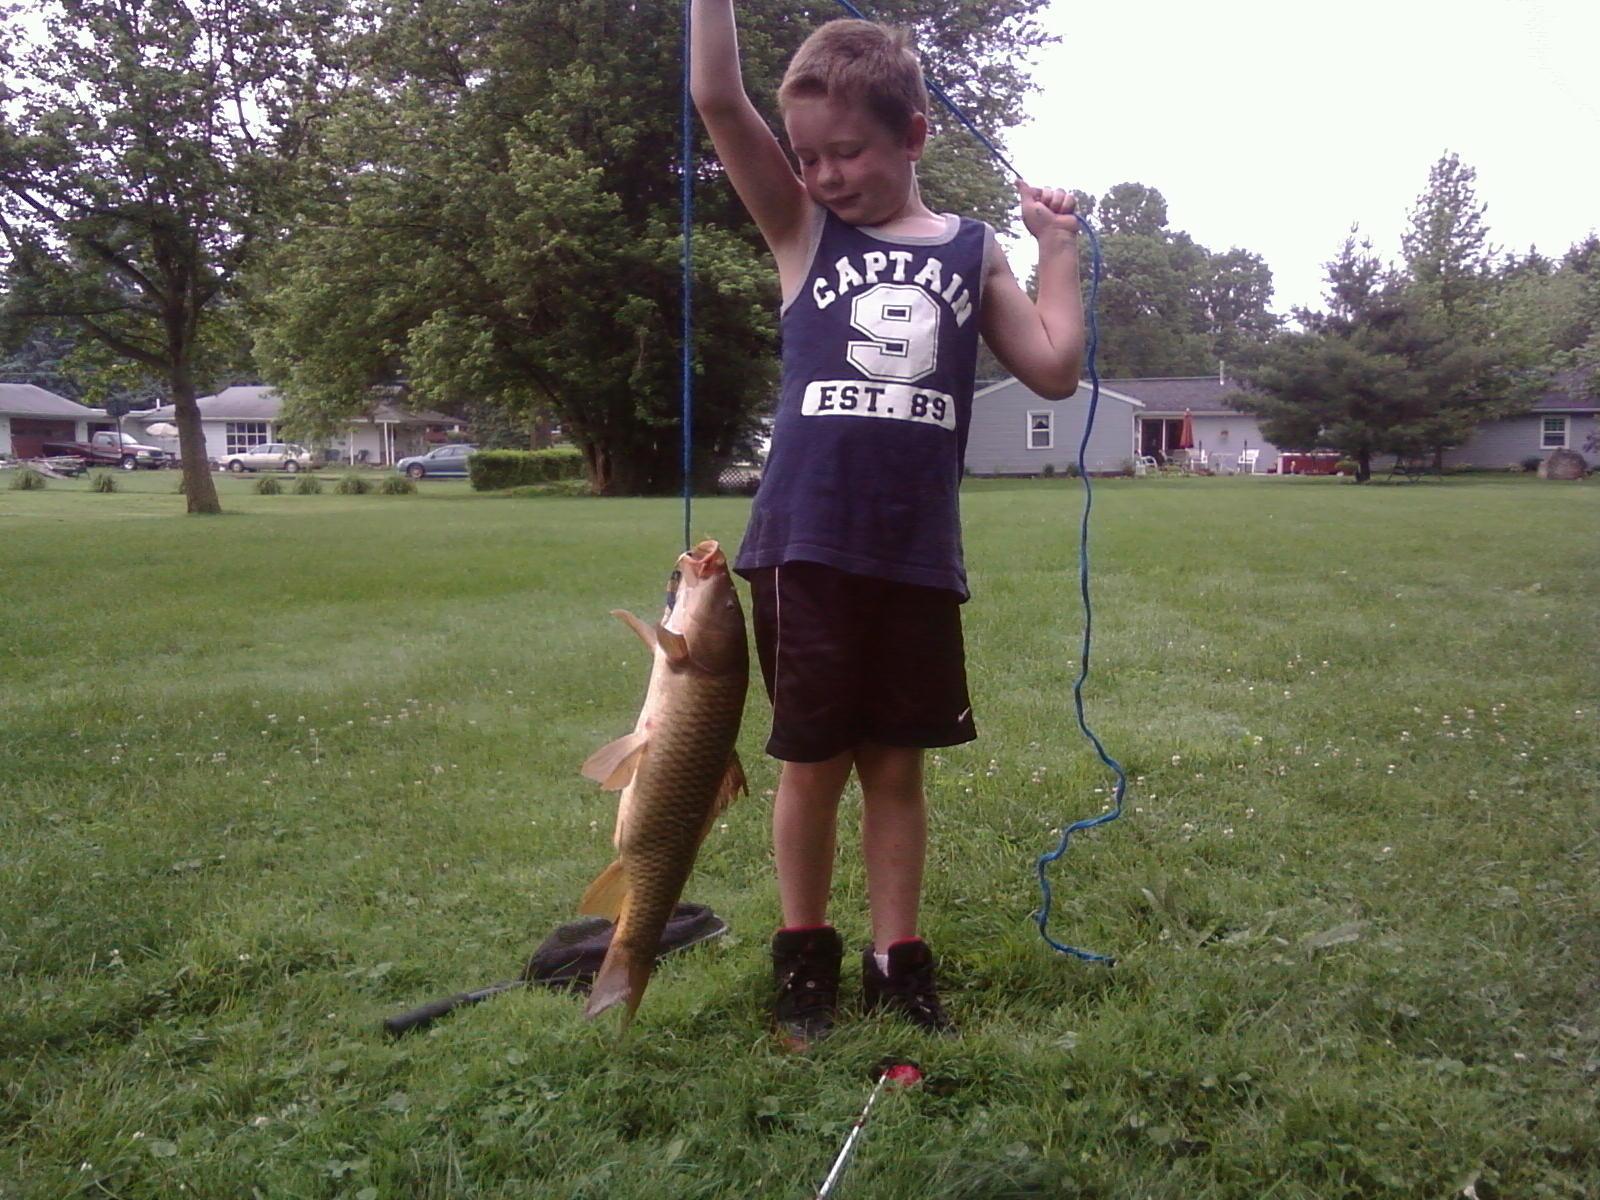 Cody's Carp